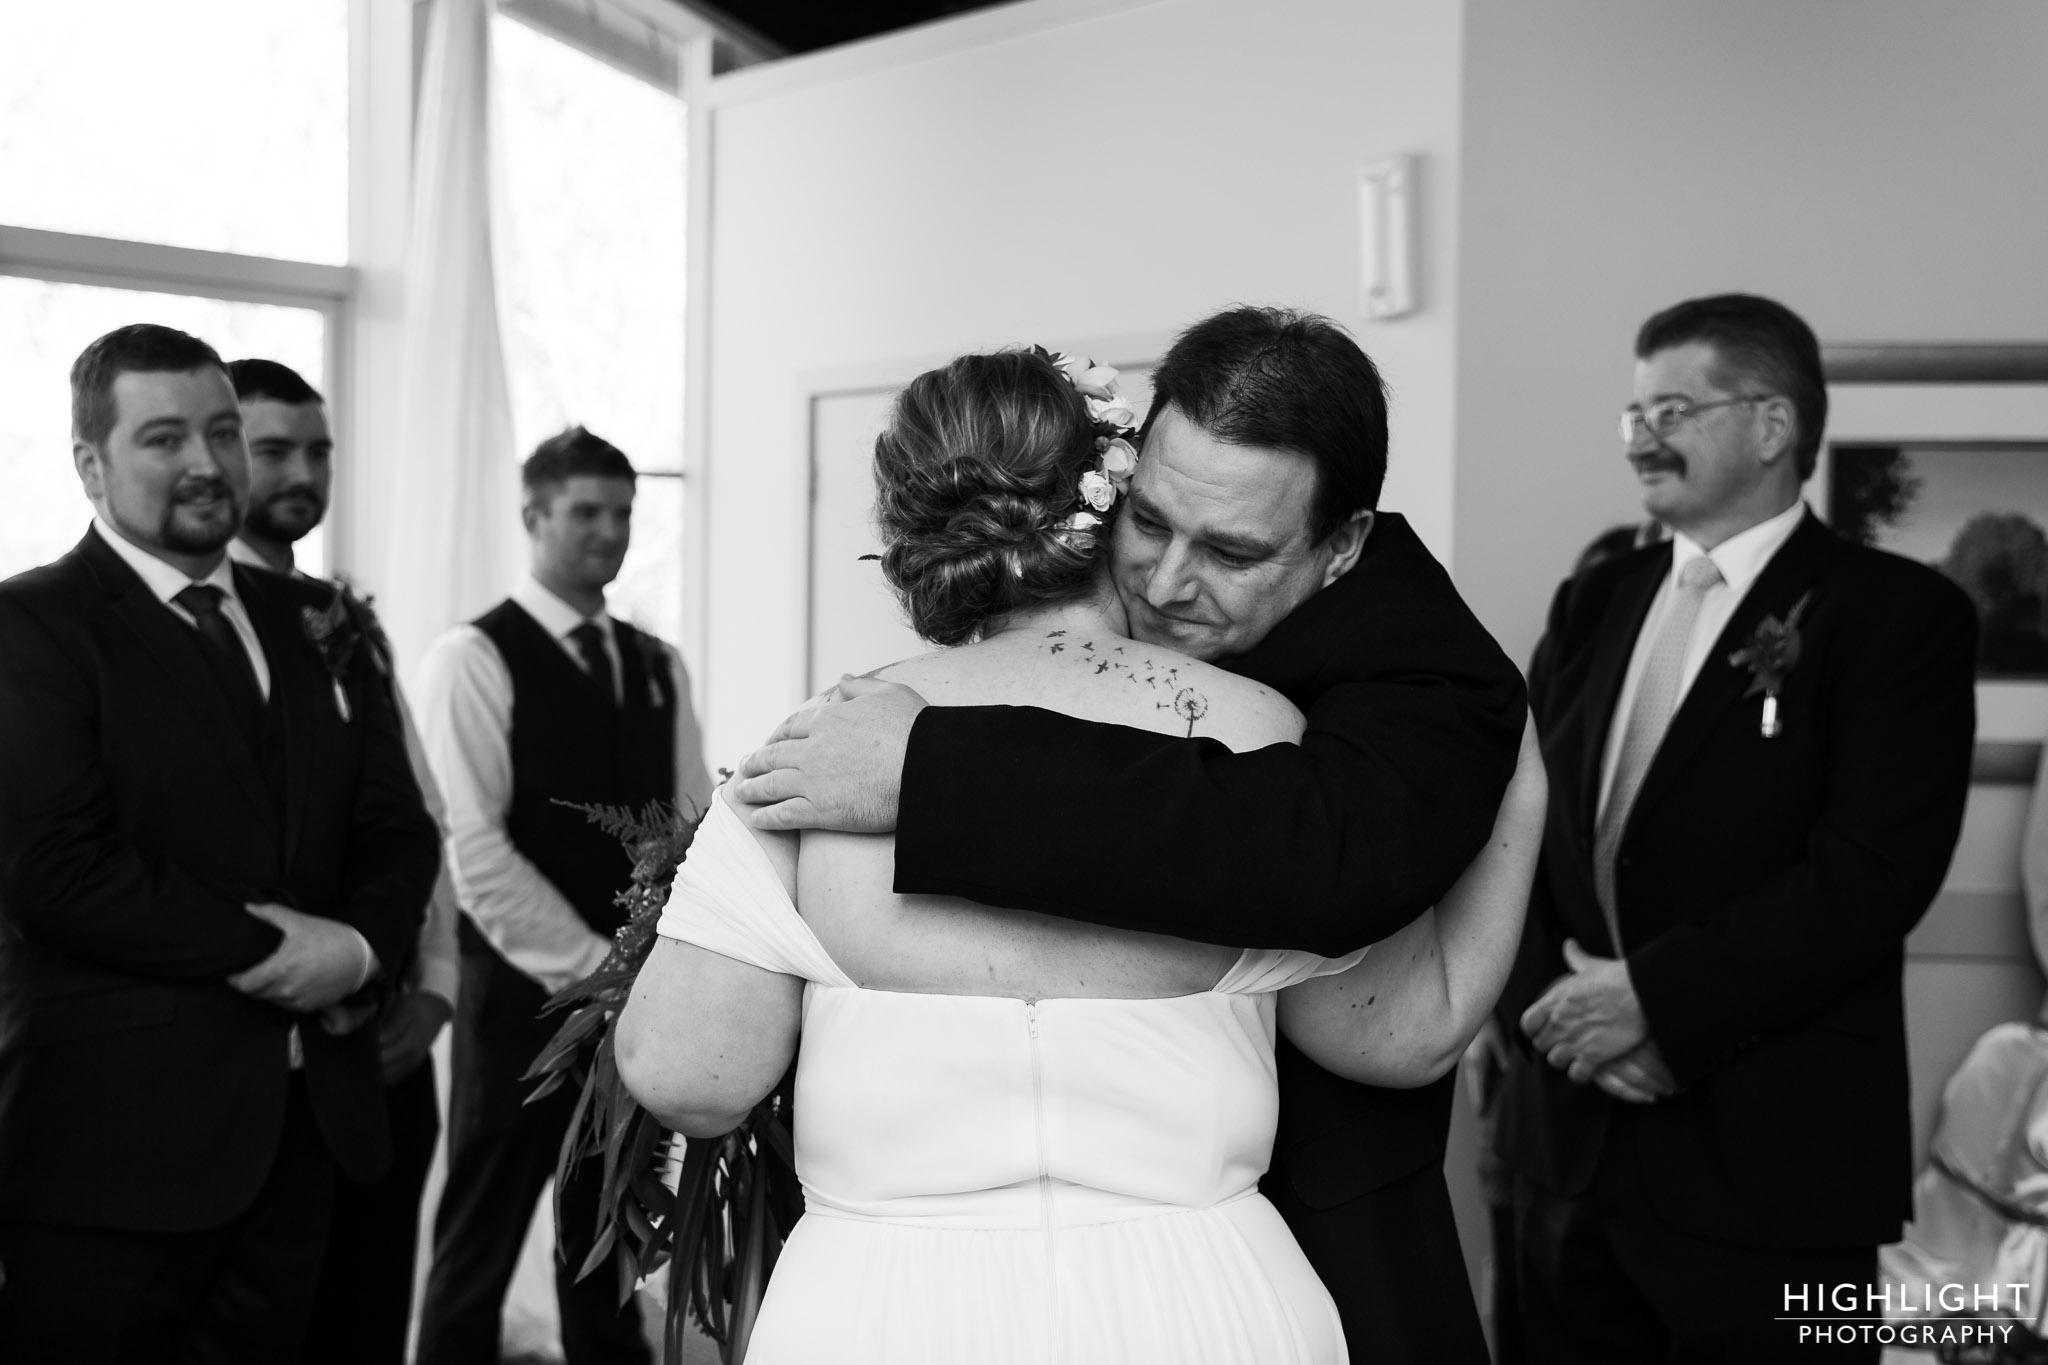 Highlight-wedding-photography-new-zealand-palmerston-north-45.jpg